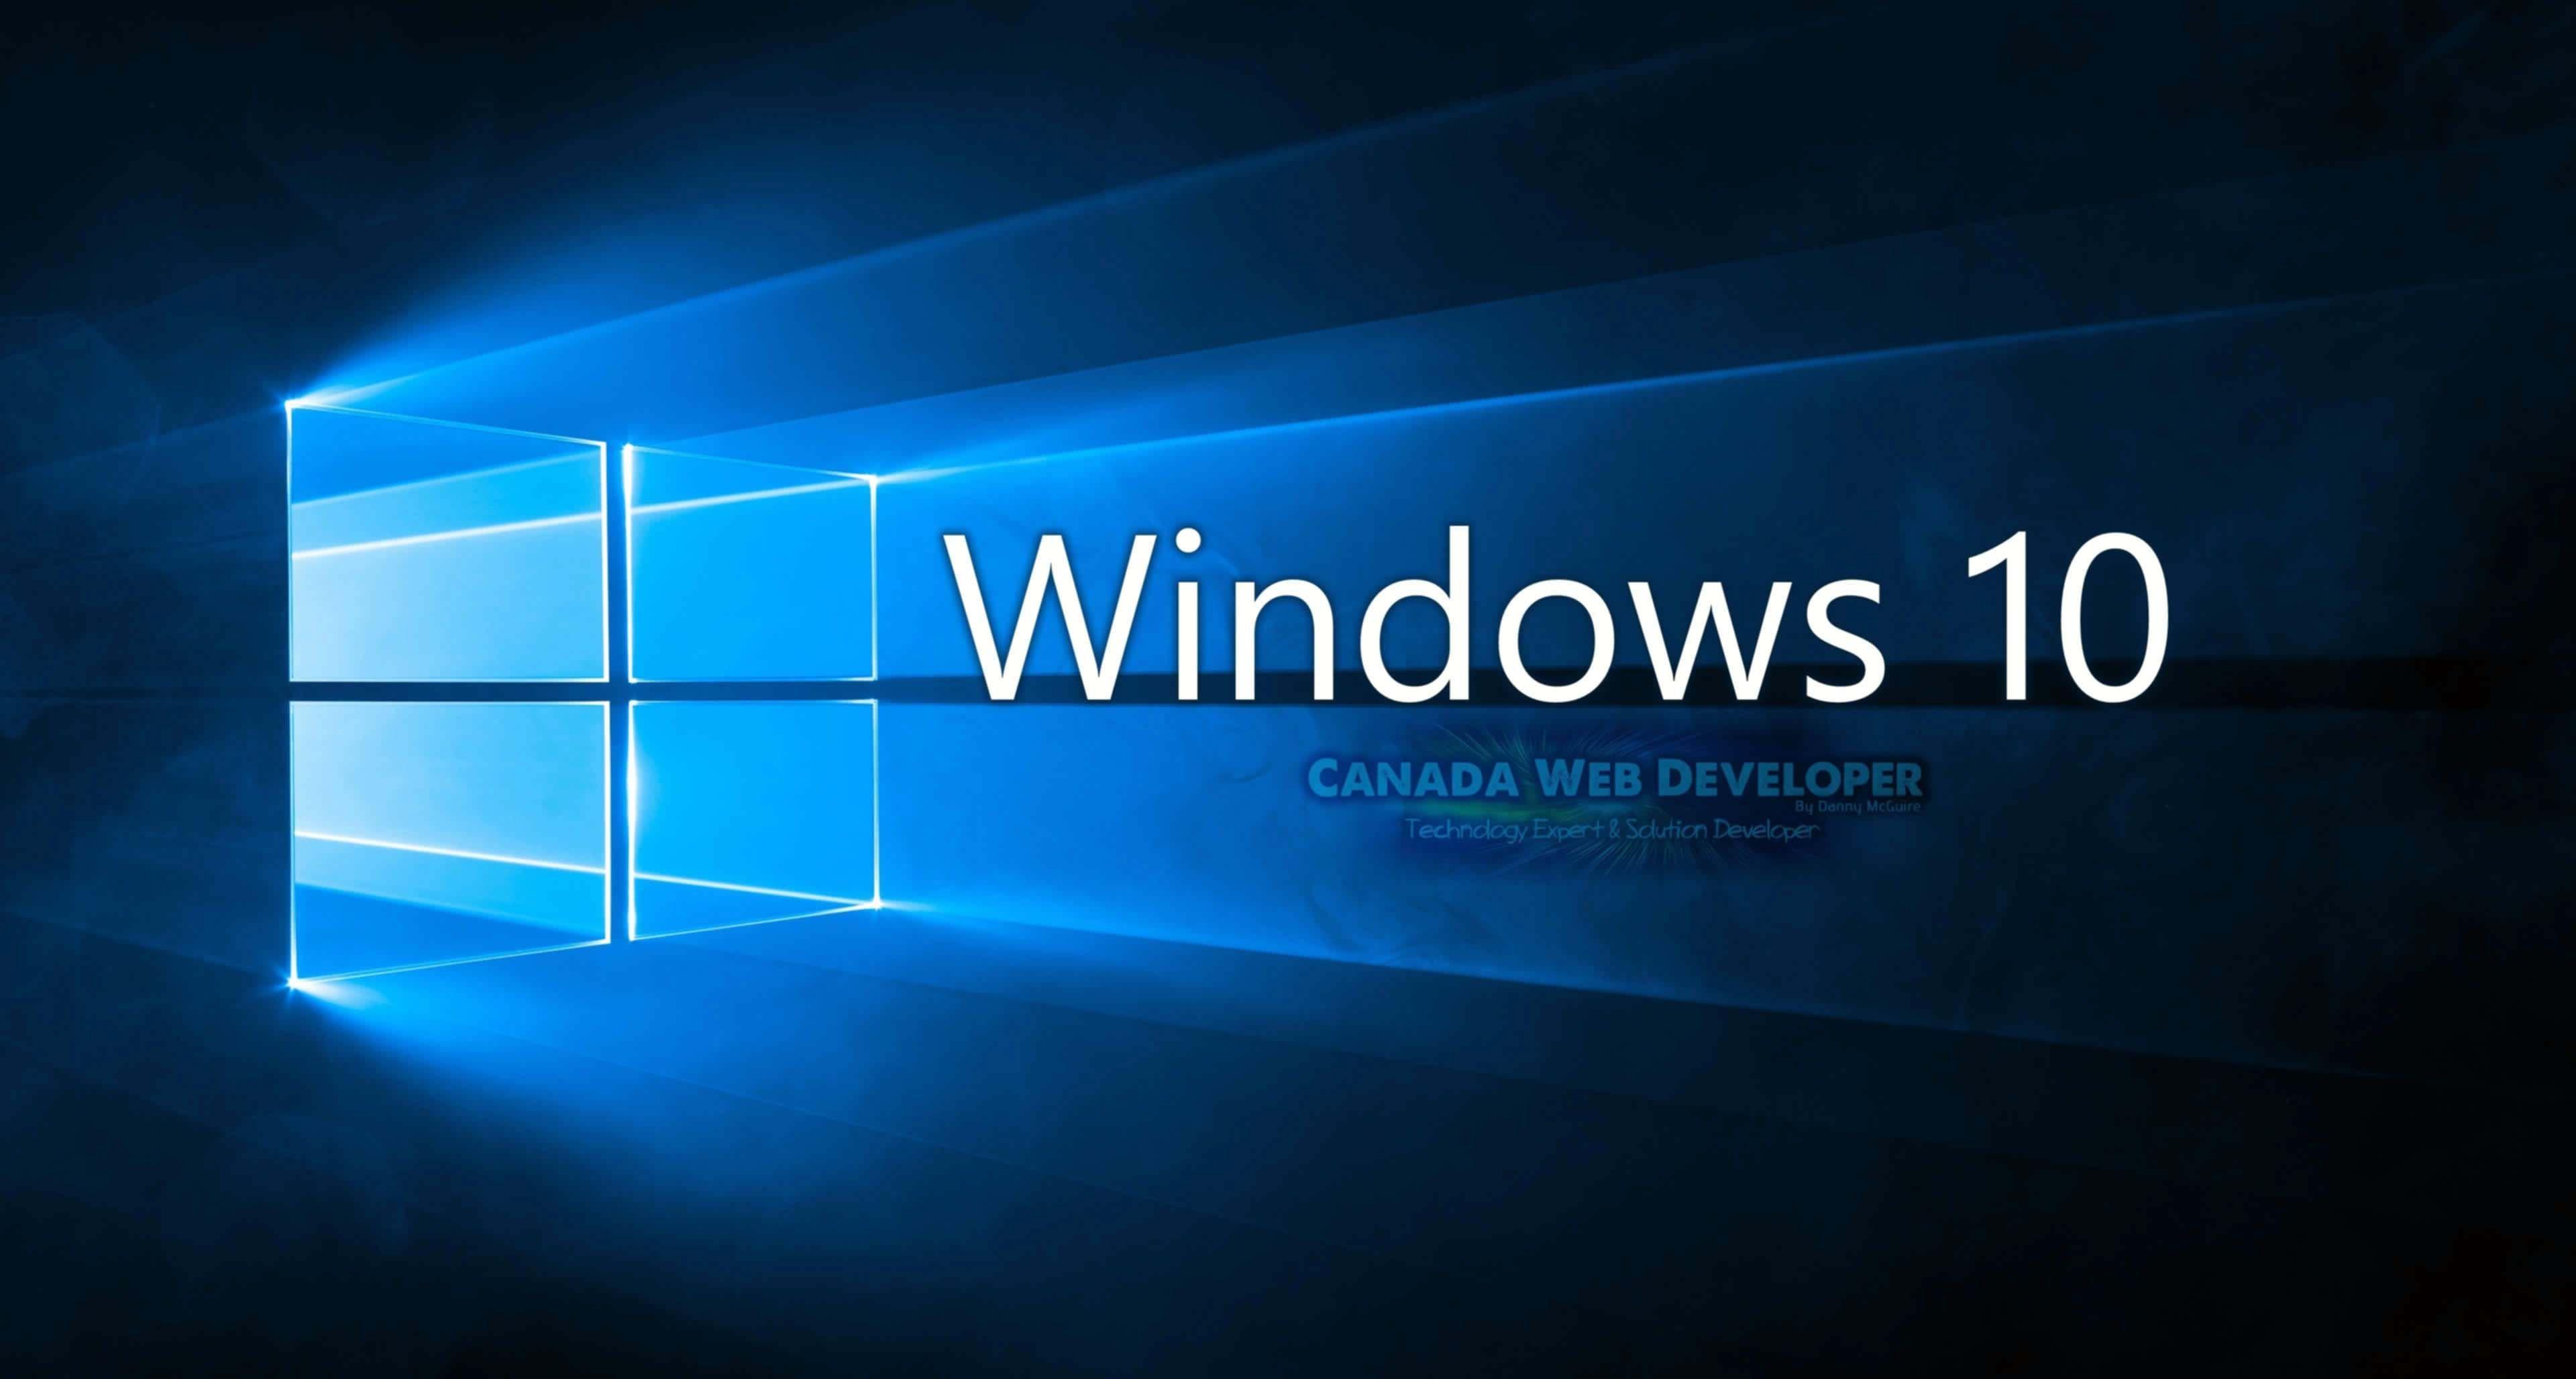 Licenses For Microsoft Volume Microsoft Office Microsoft Windows 10 Windows Server Office 365 Microsoft In 2021 Wallpaper Windows 10 Windows Wallpaper Windows 10